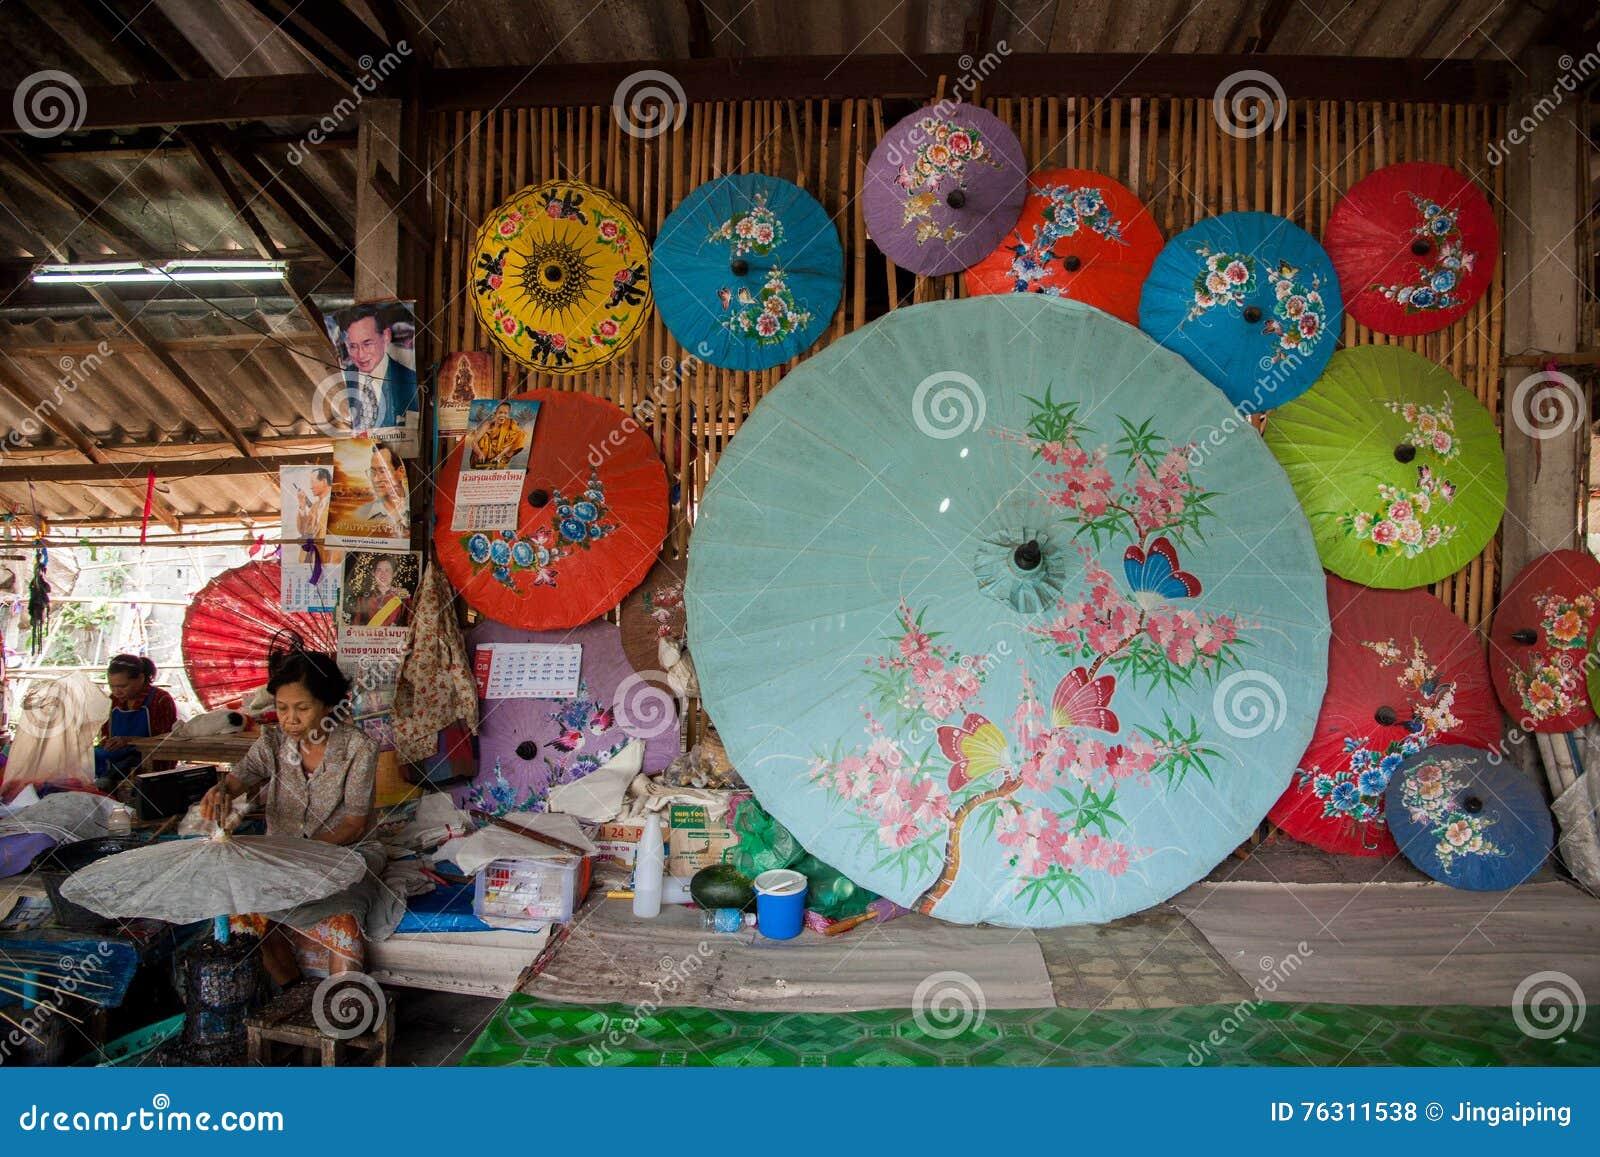 Chiang Mai Thailand Handmade Umbrella Making Process Editorial Stock Photo Image Of Paper Great 76311538